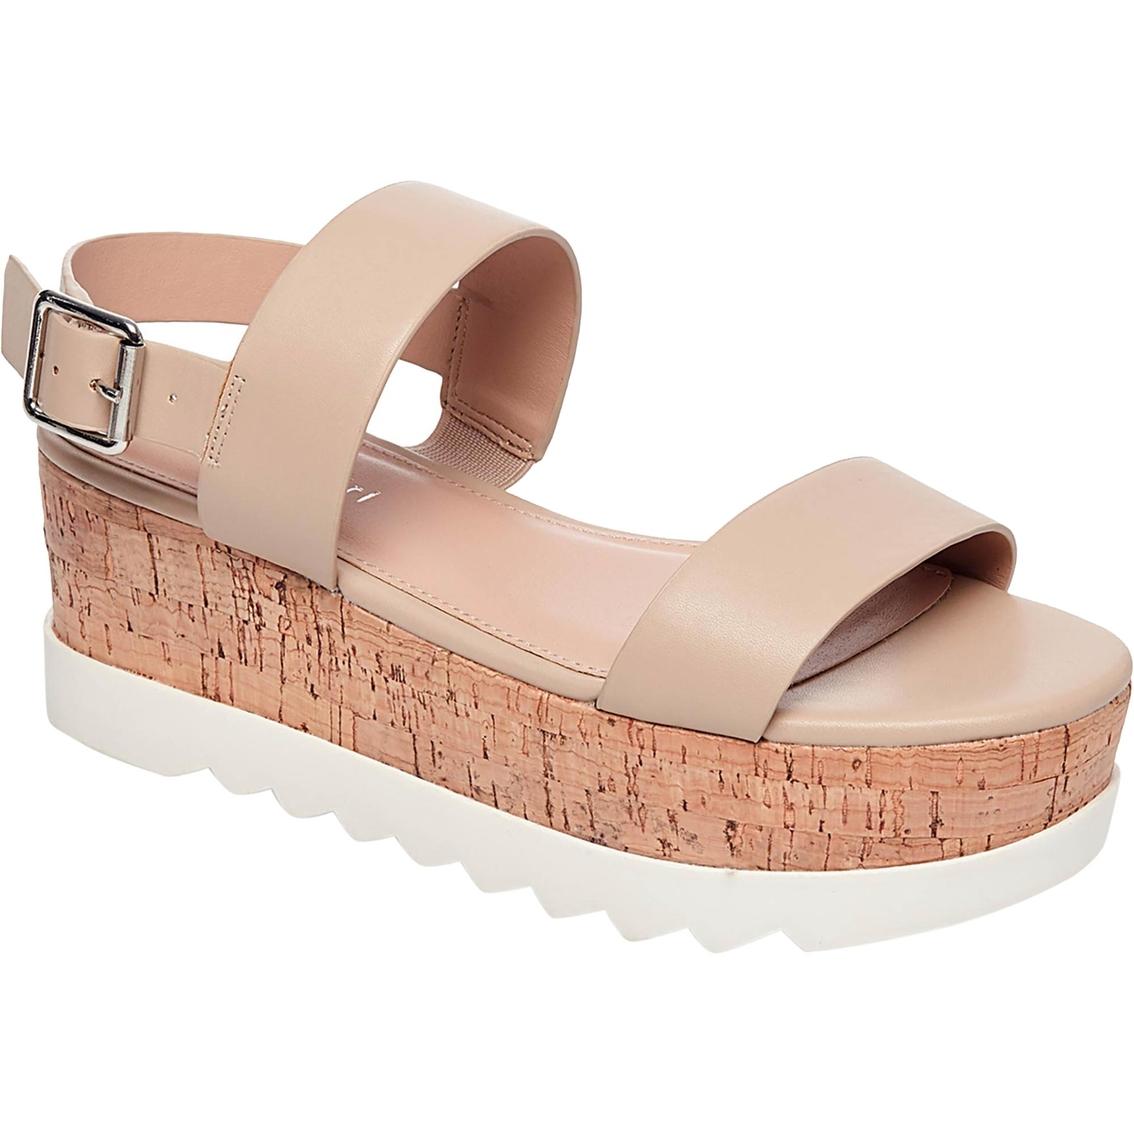 587d851ba77 Madden Girl Sugar Wedge Sandals